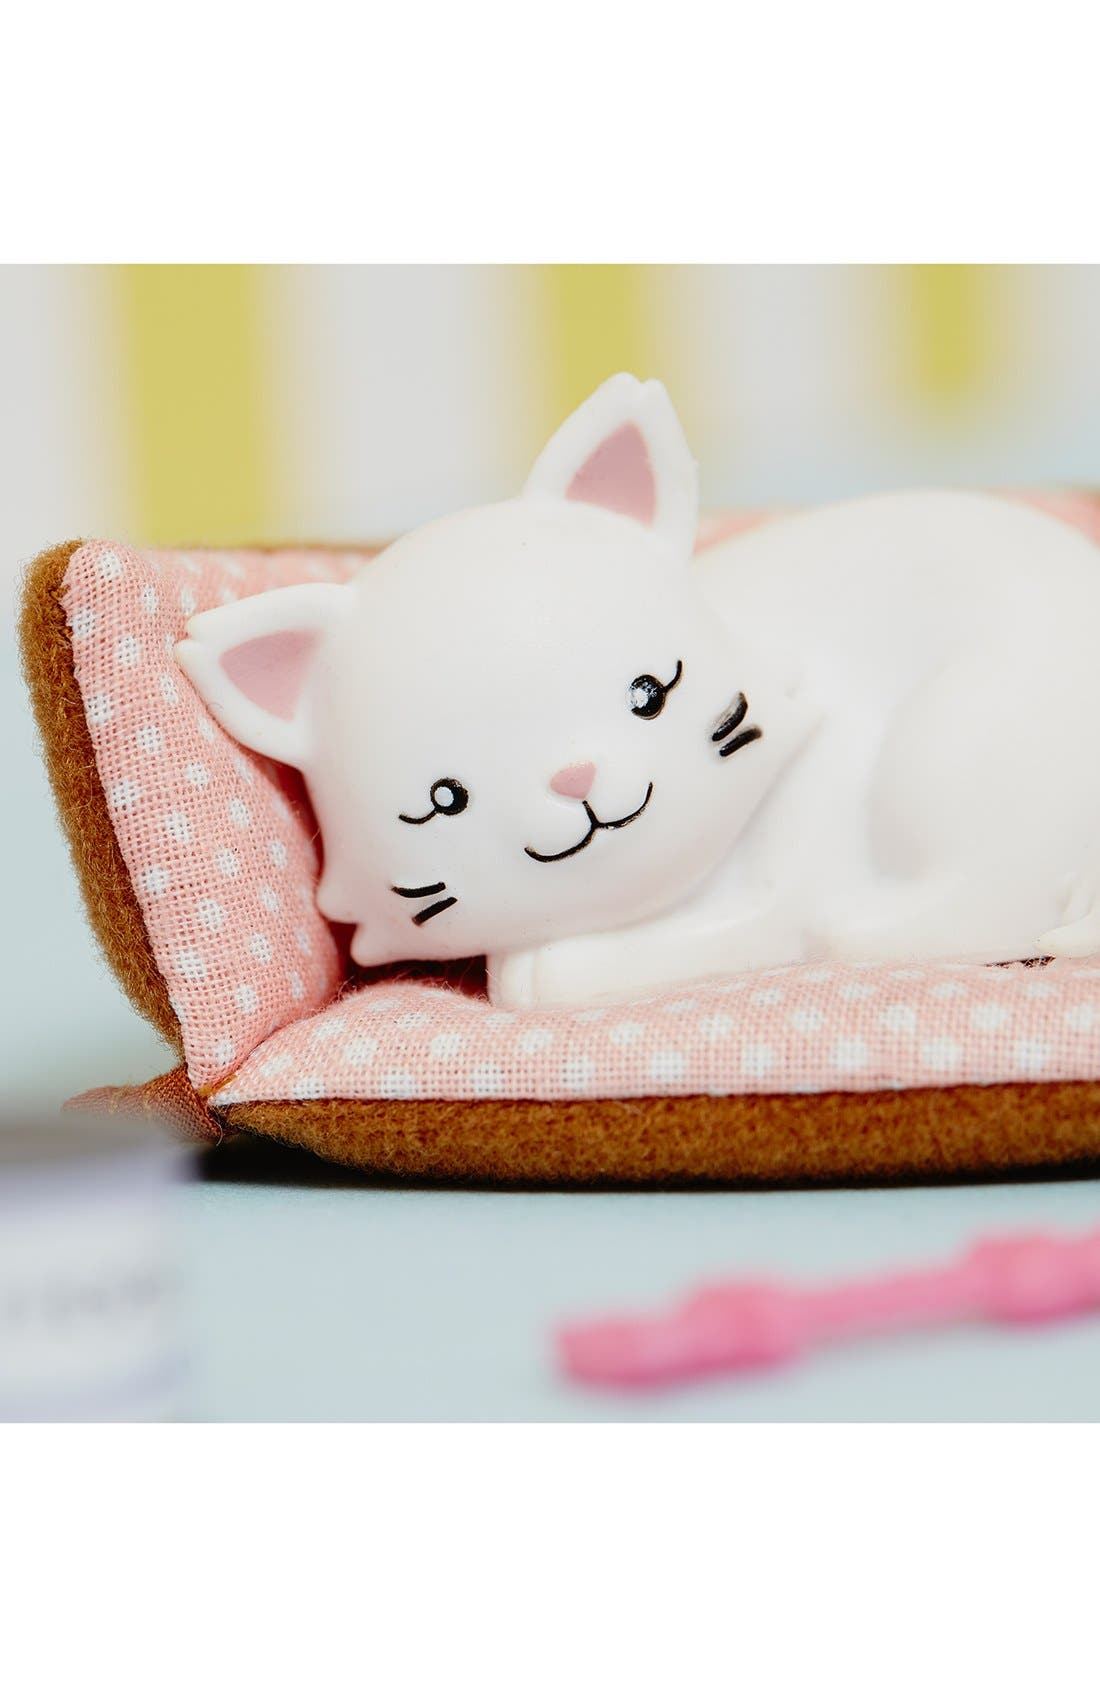 Main Image - Schylling 'Pandora the Persian Cat' Lottie™ Doll Accessory Set